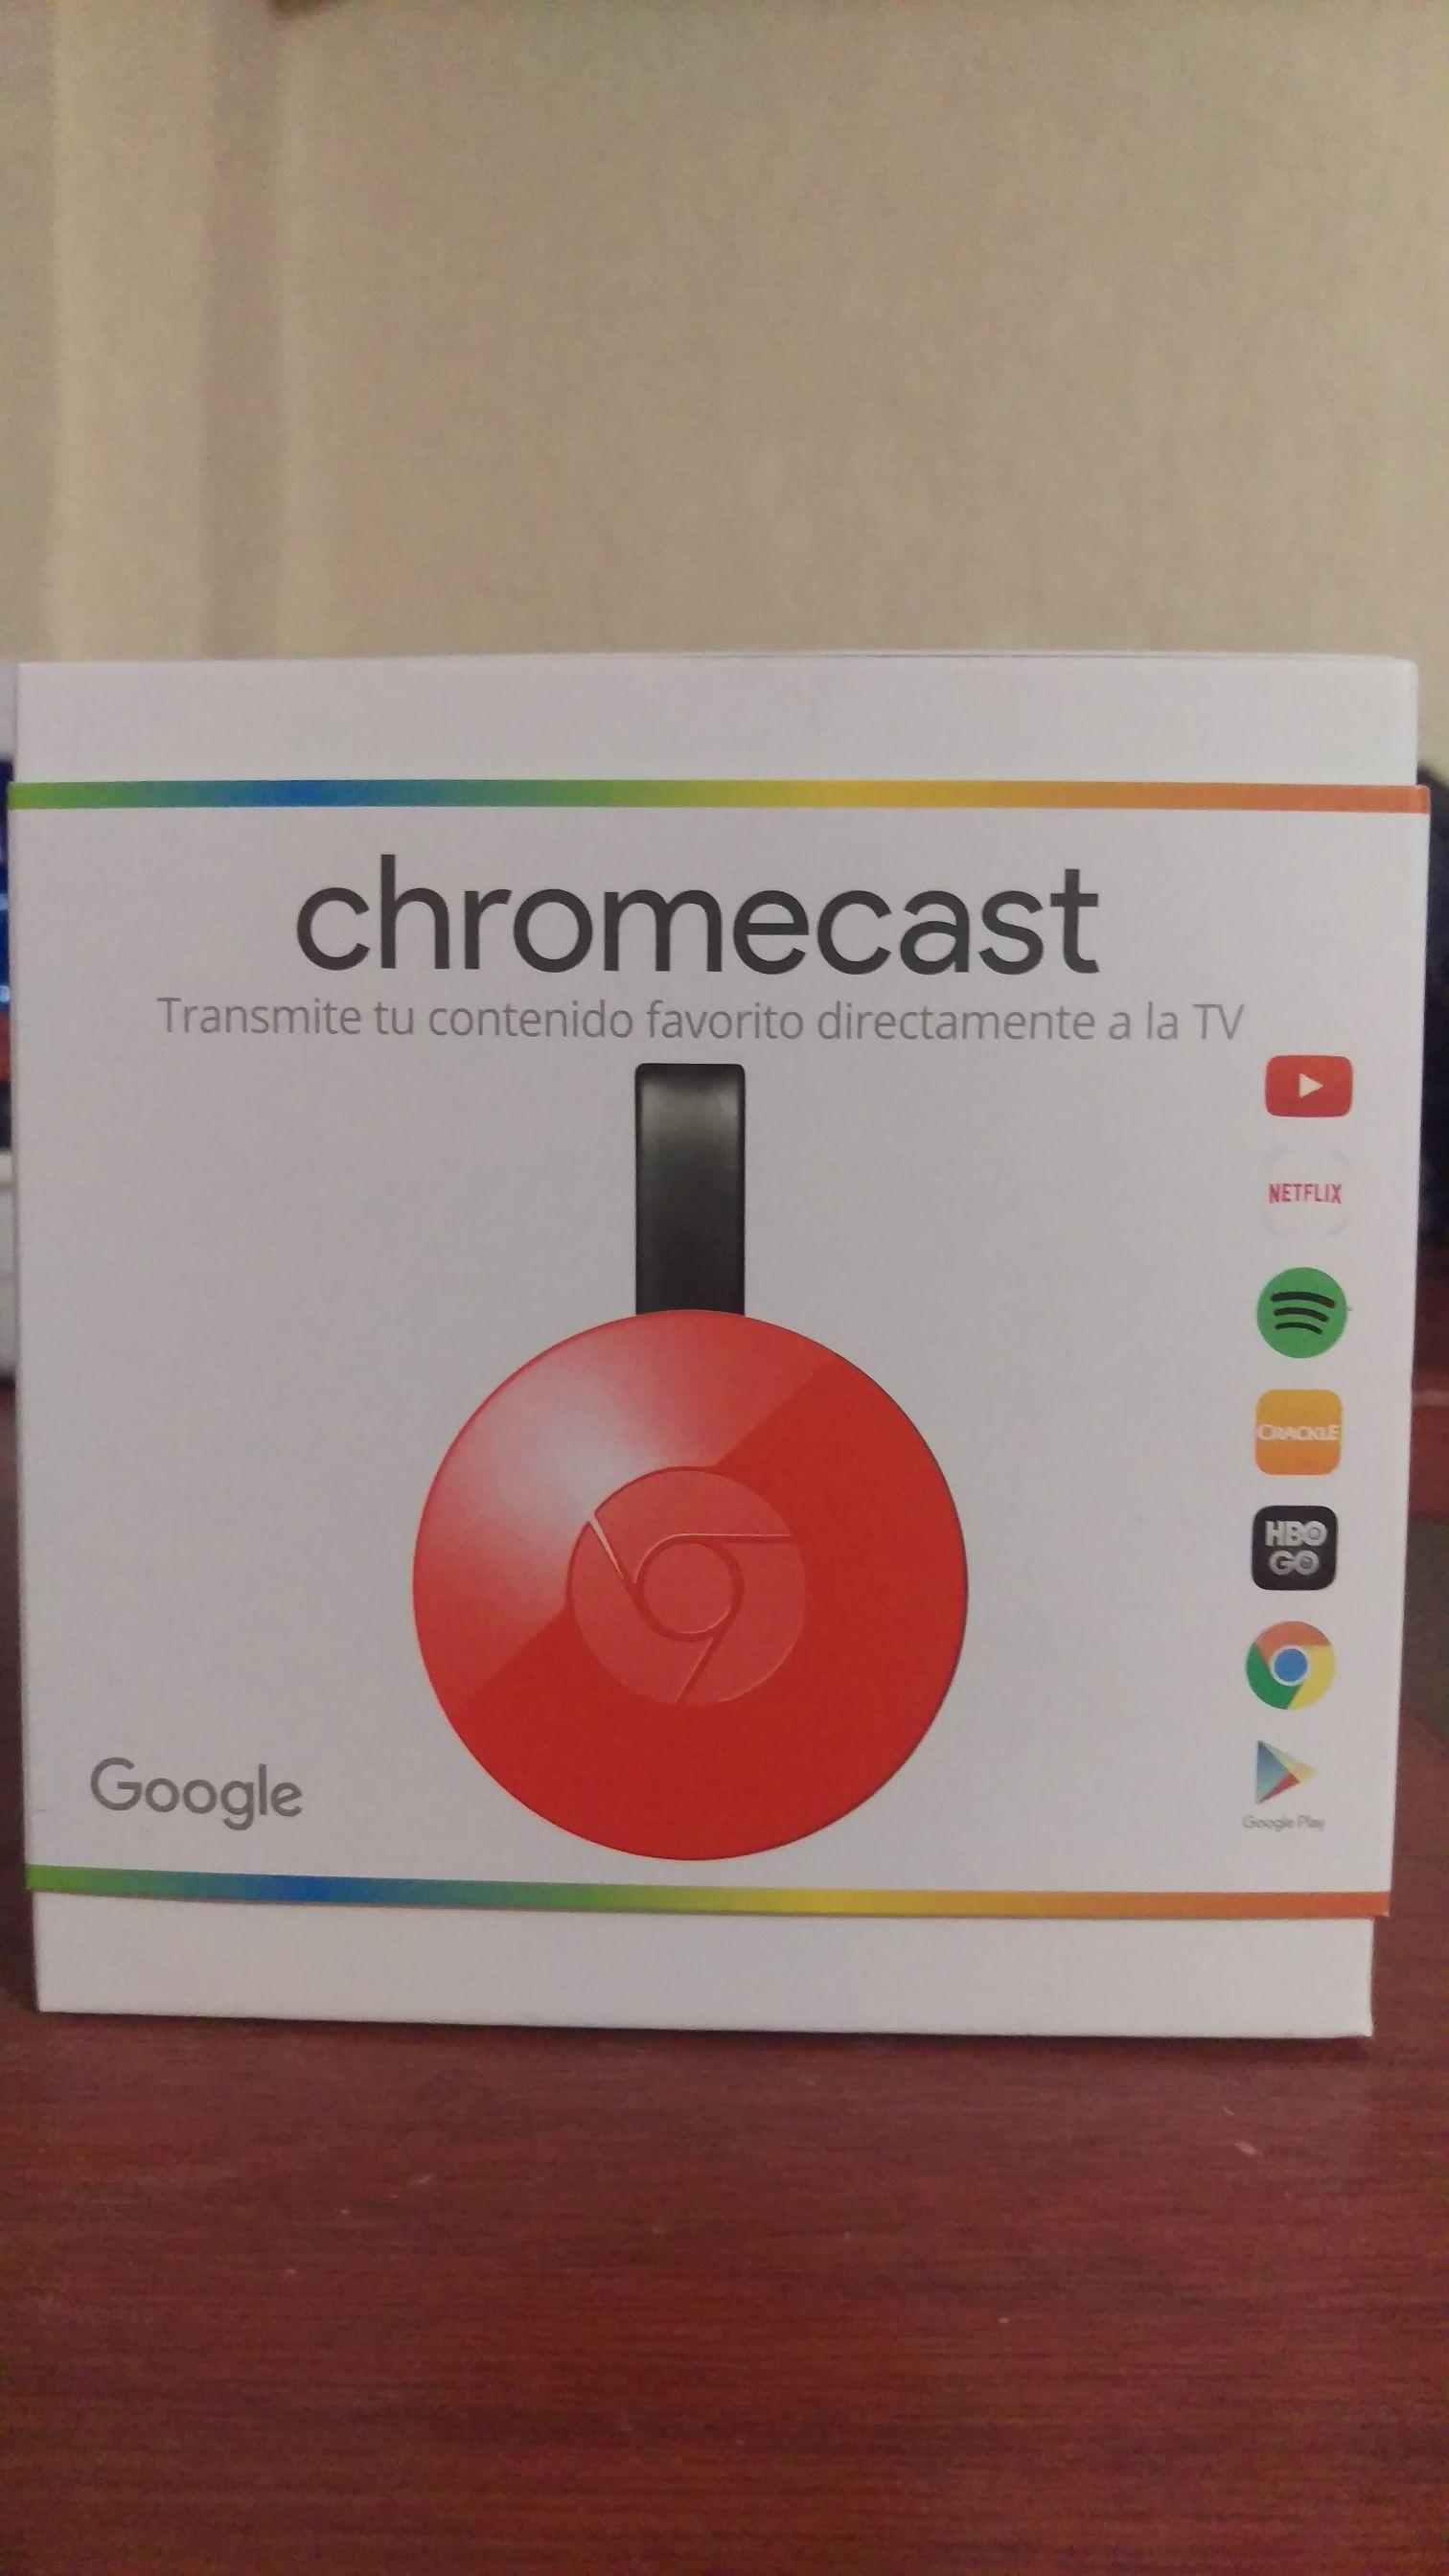 Radioshack: 20% de descuento en Chromecast